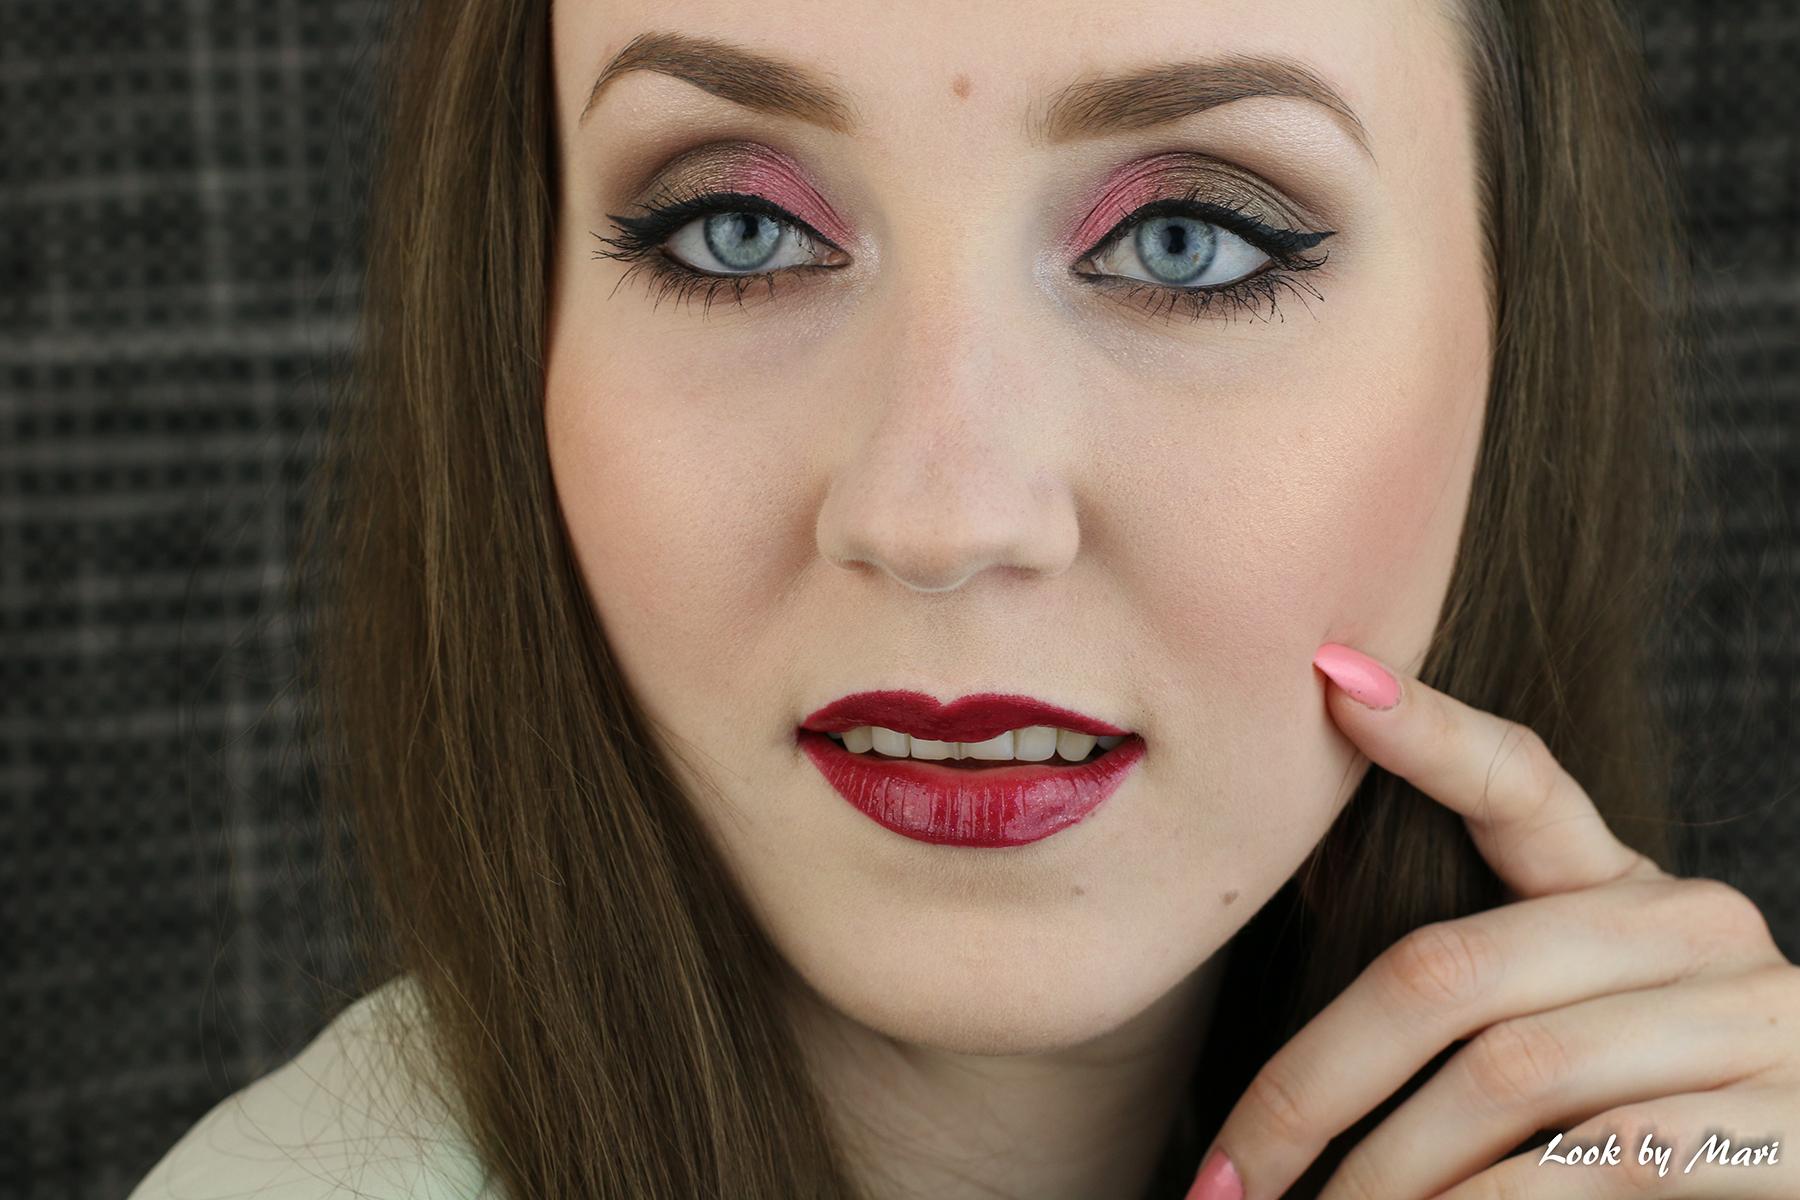 18 maybelline the 24karat nudes eyeshadow paletti review swatches makeup kokemuksia luomiväripaletti